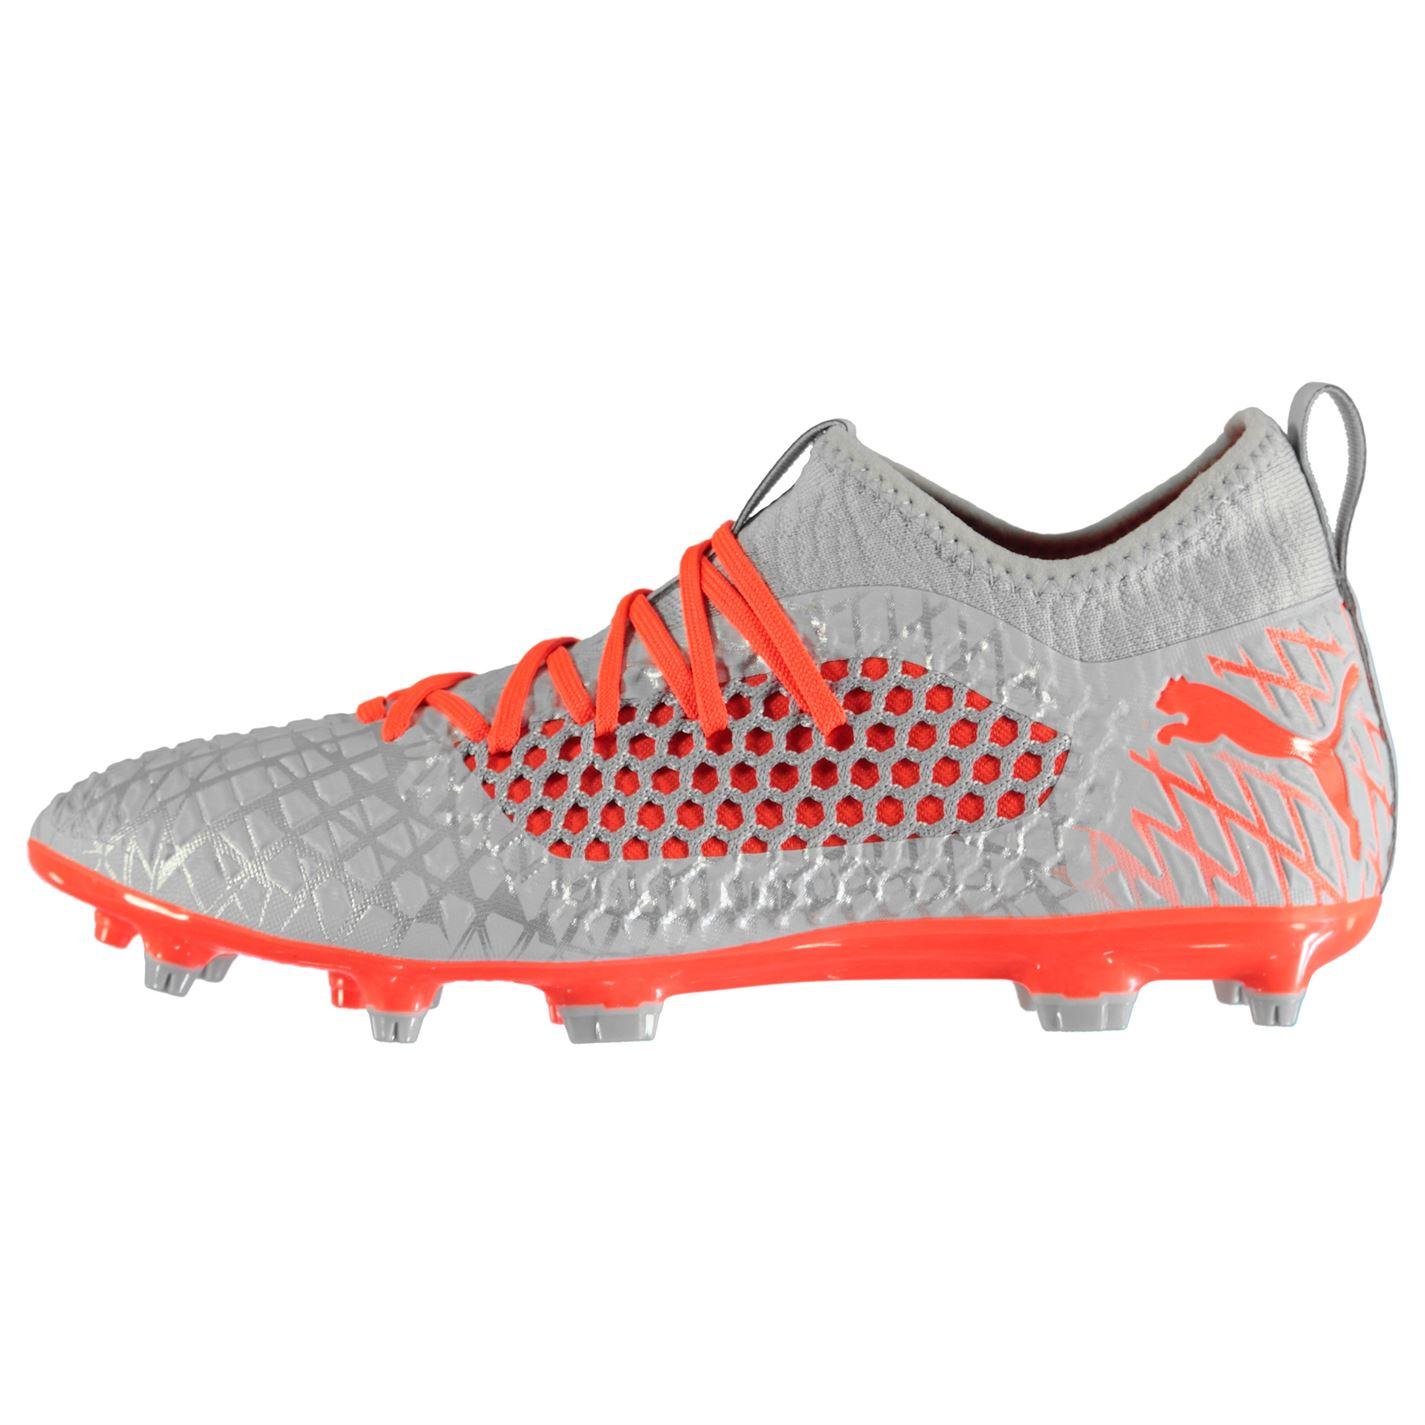 Puma Future 4.3 Mens FG Football Boots